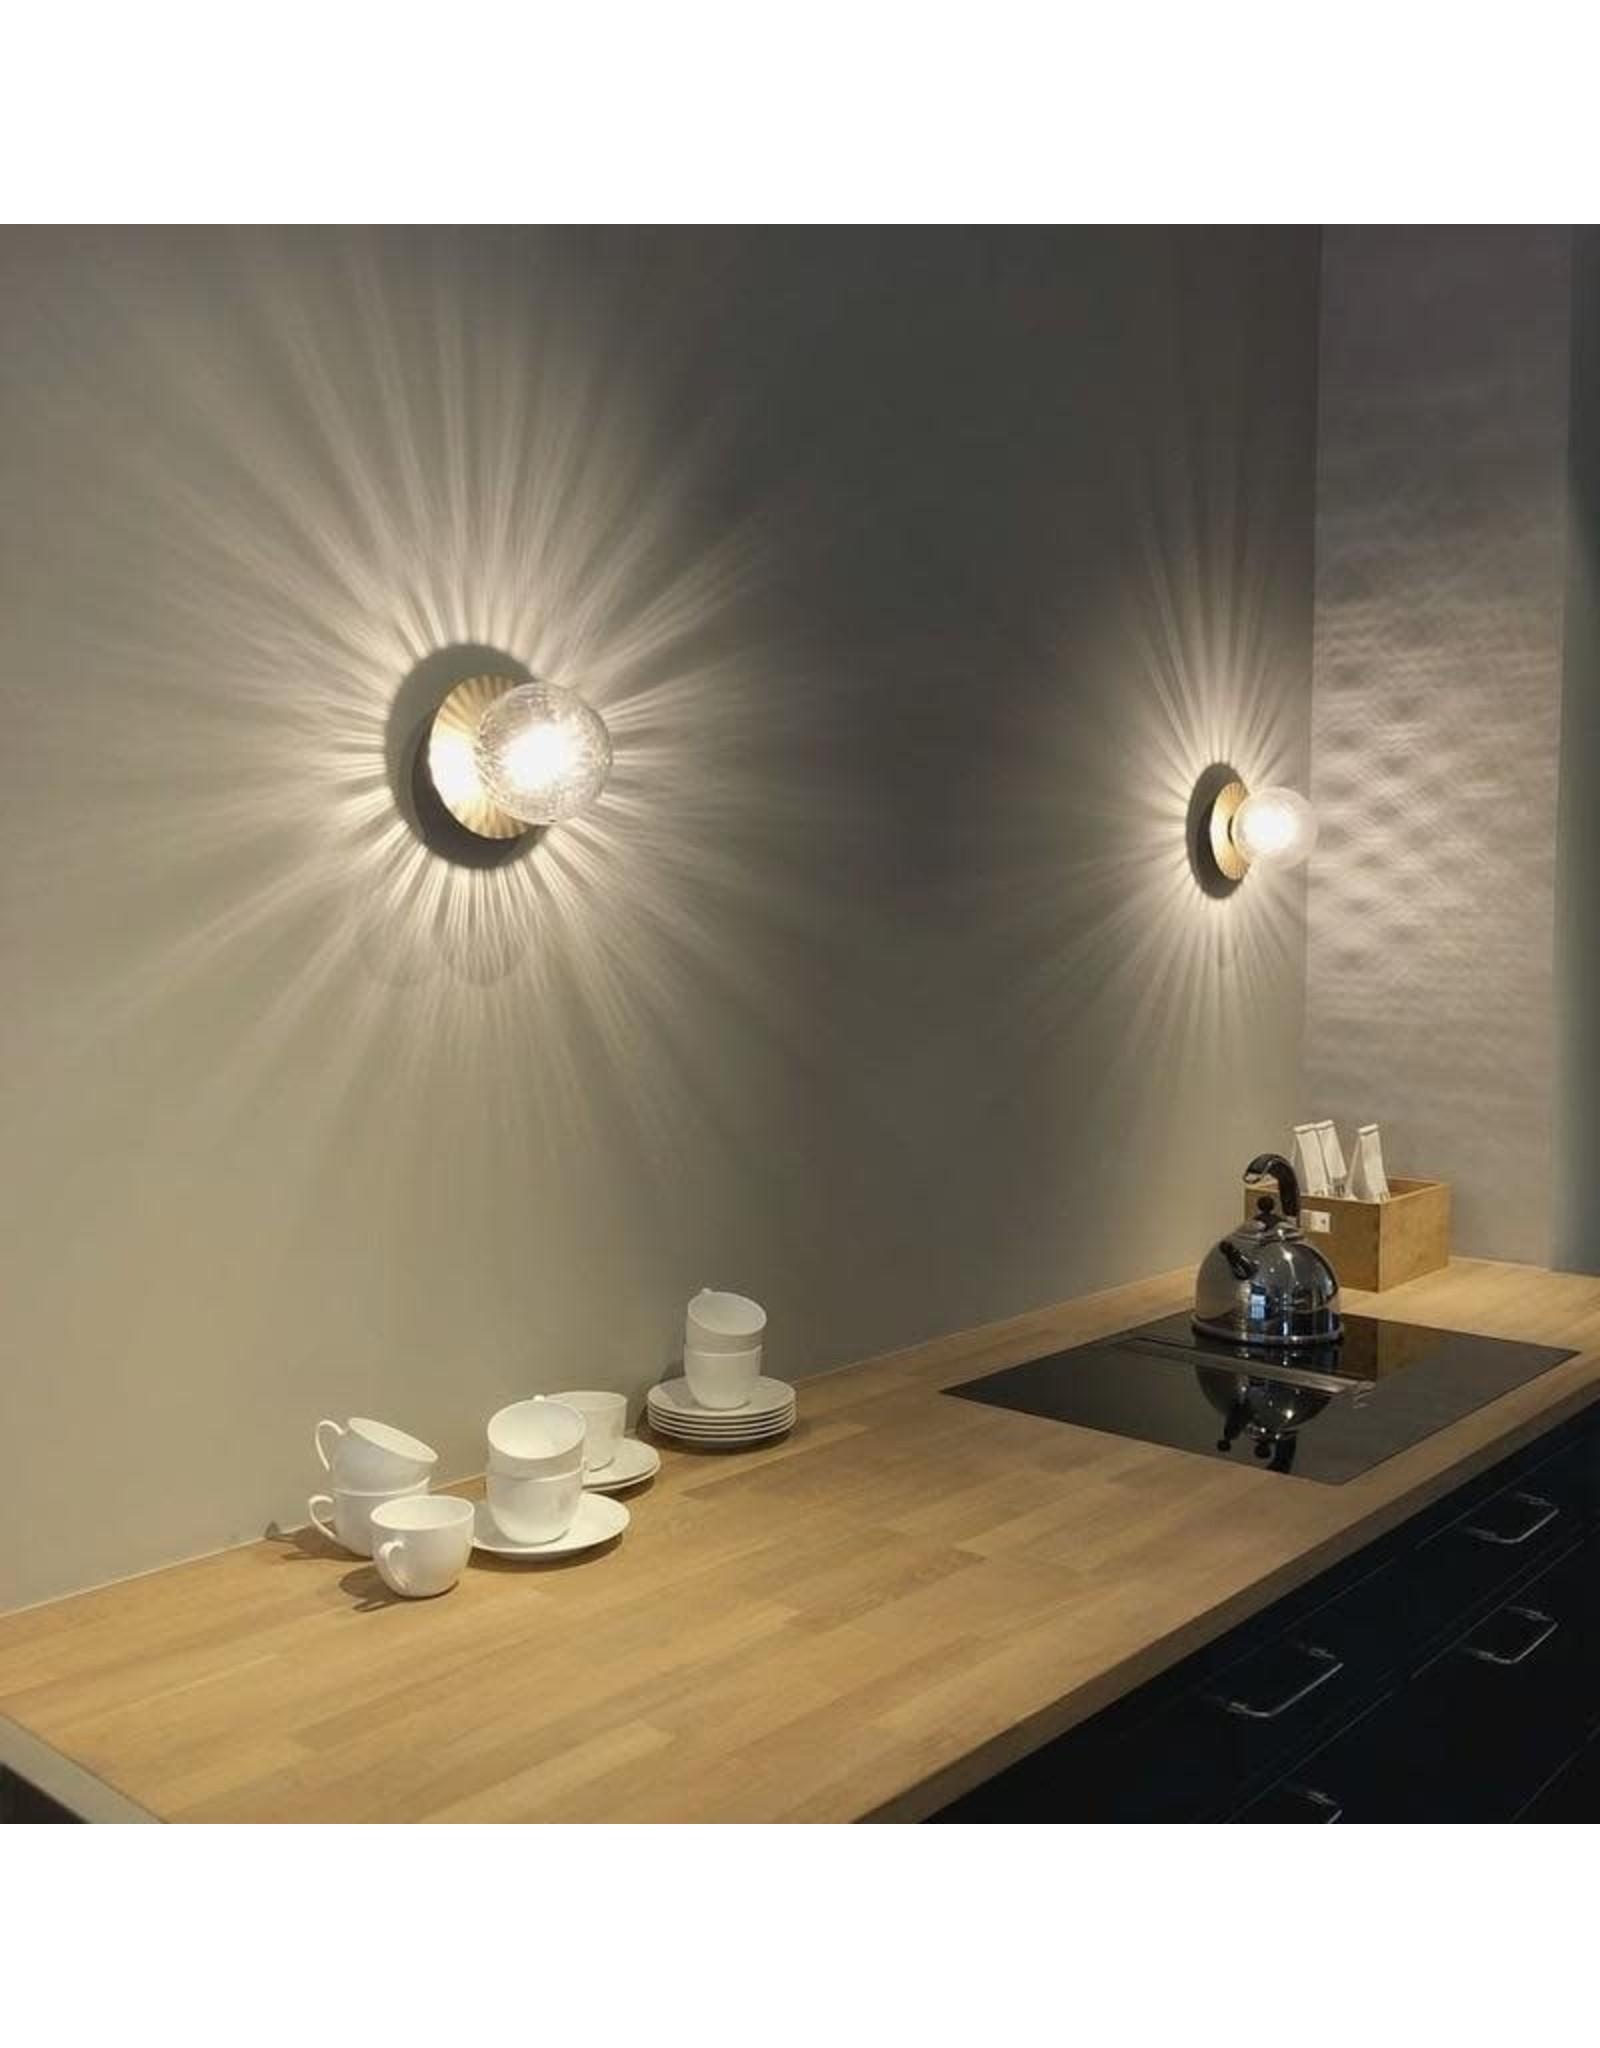 LIILA 1 LARGE WALL/CEILING LAMP